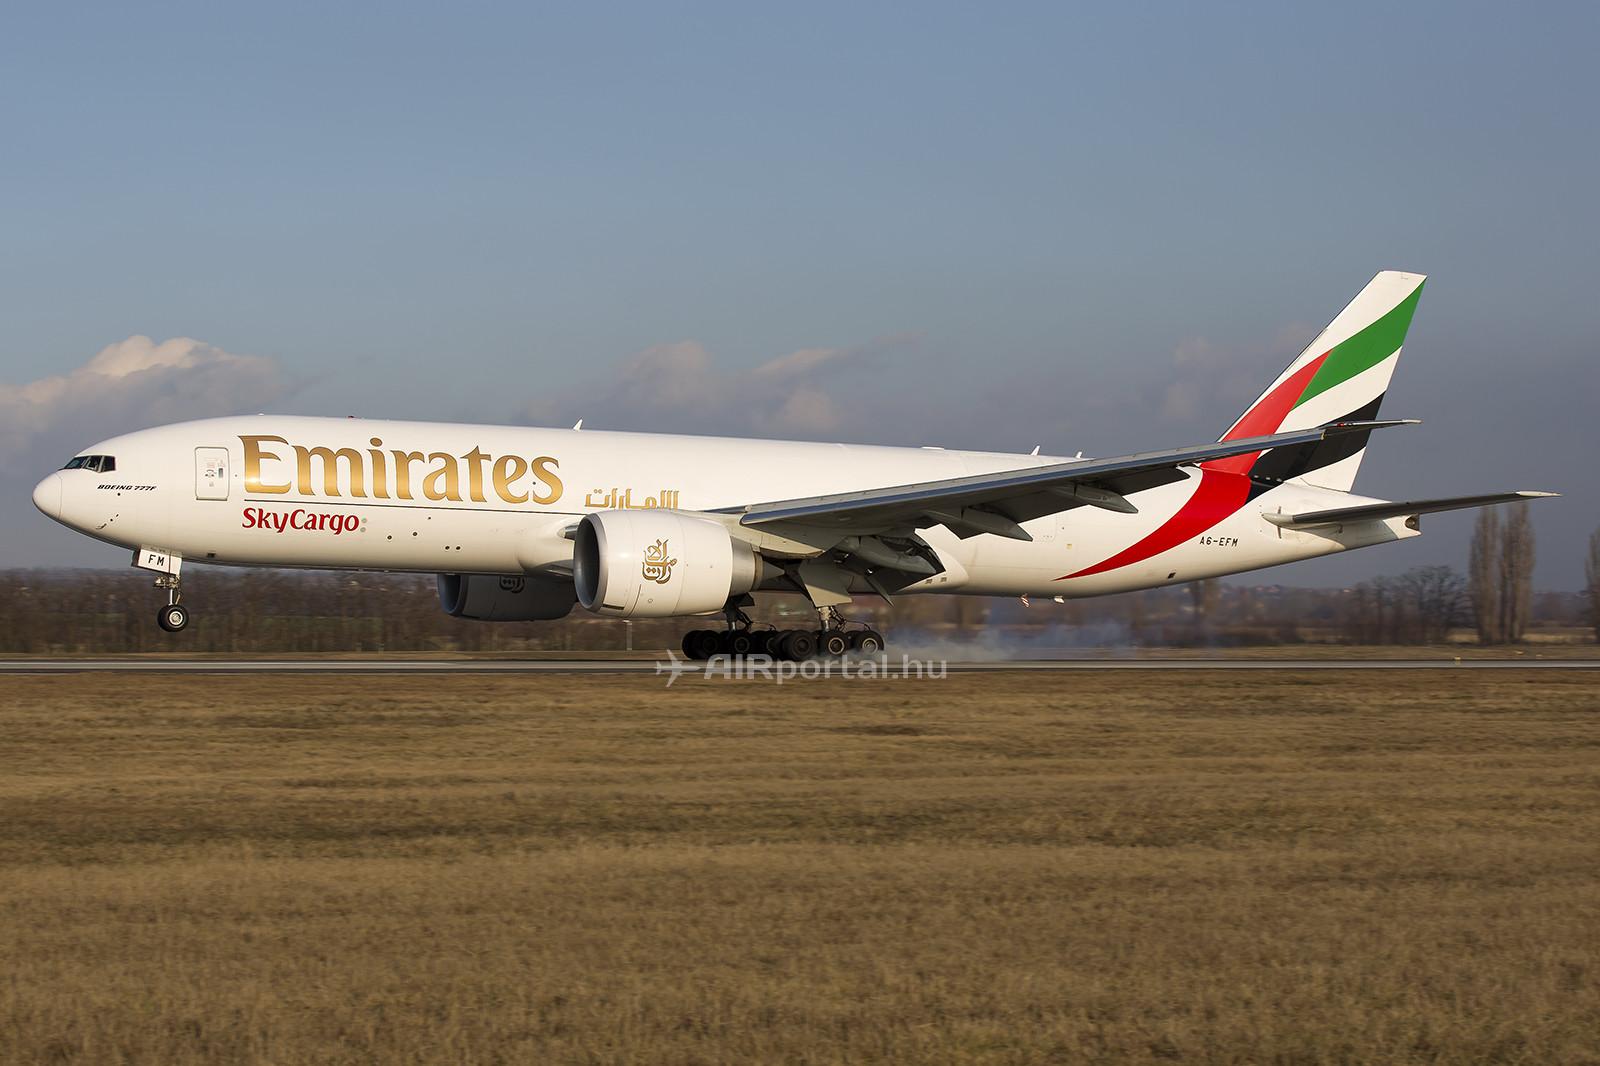 Az Emirates SkyCargo Boeing 777-es repülőgépe Budapesten. (Fotó: AIRportal.hu) | © AIRportal.hu